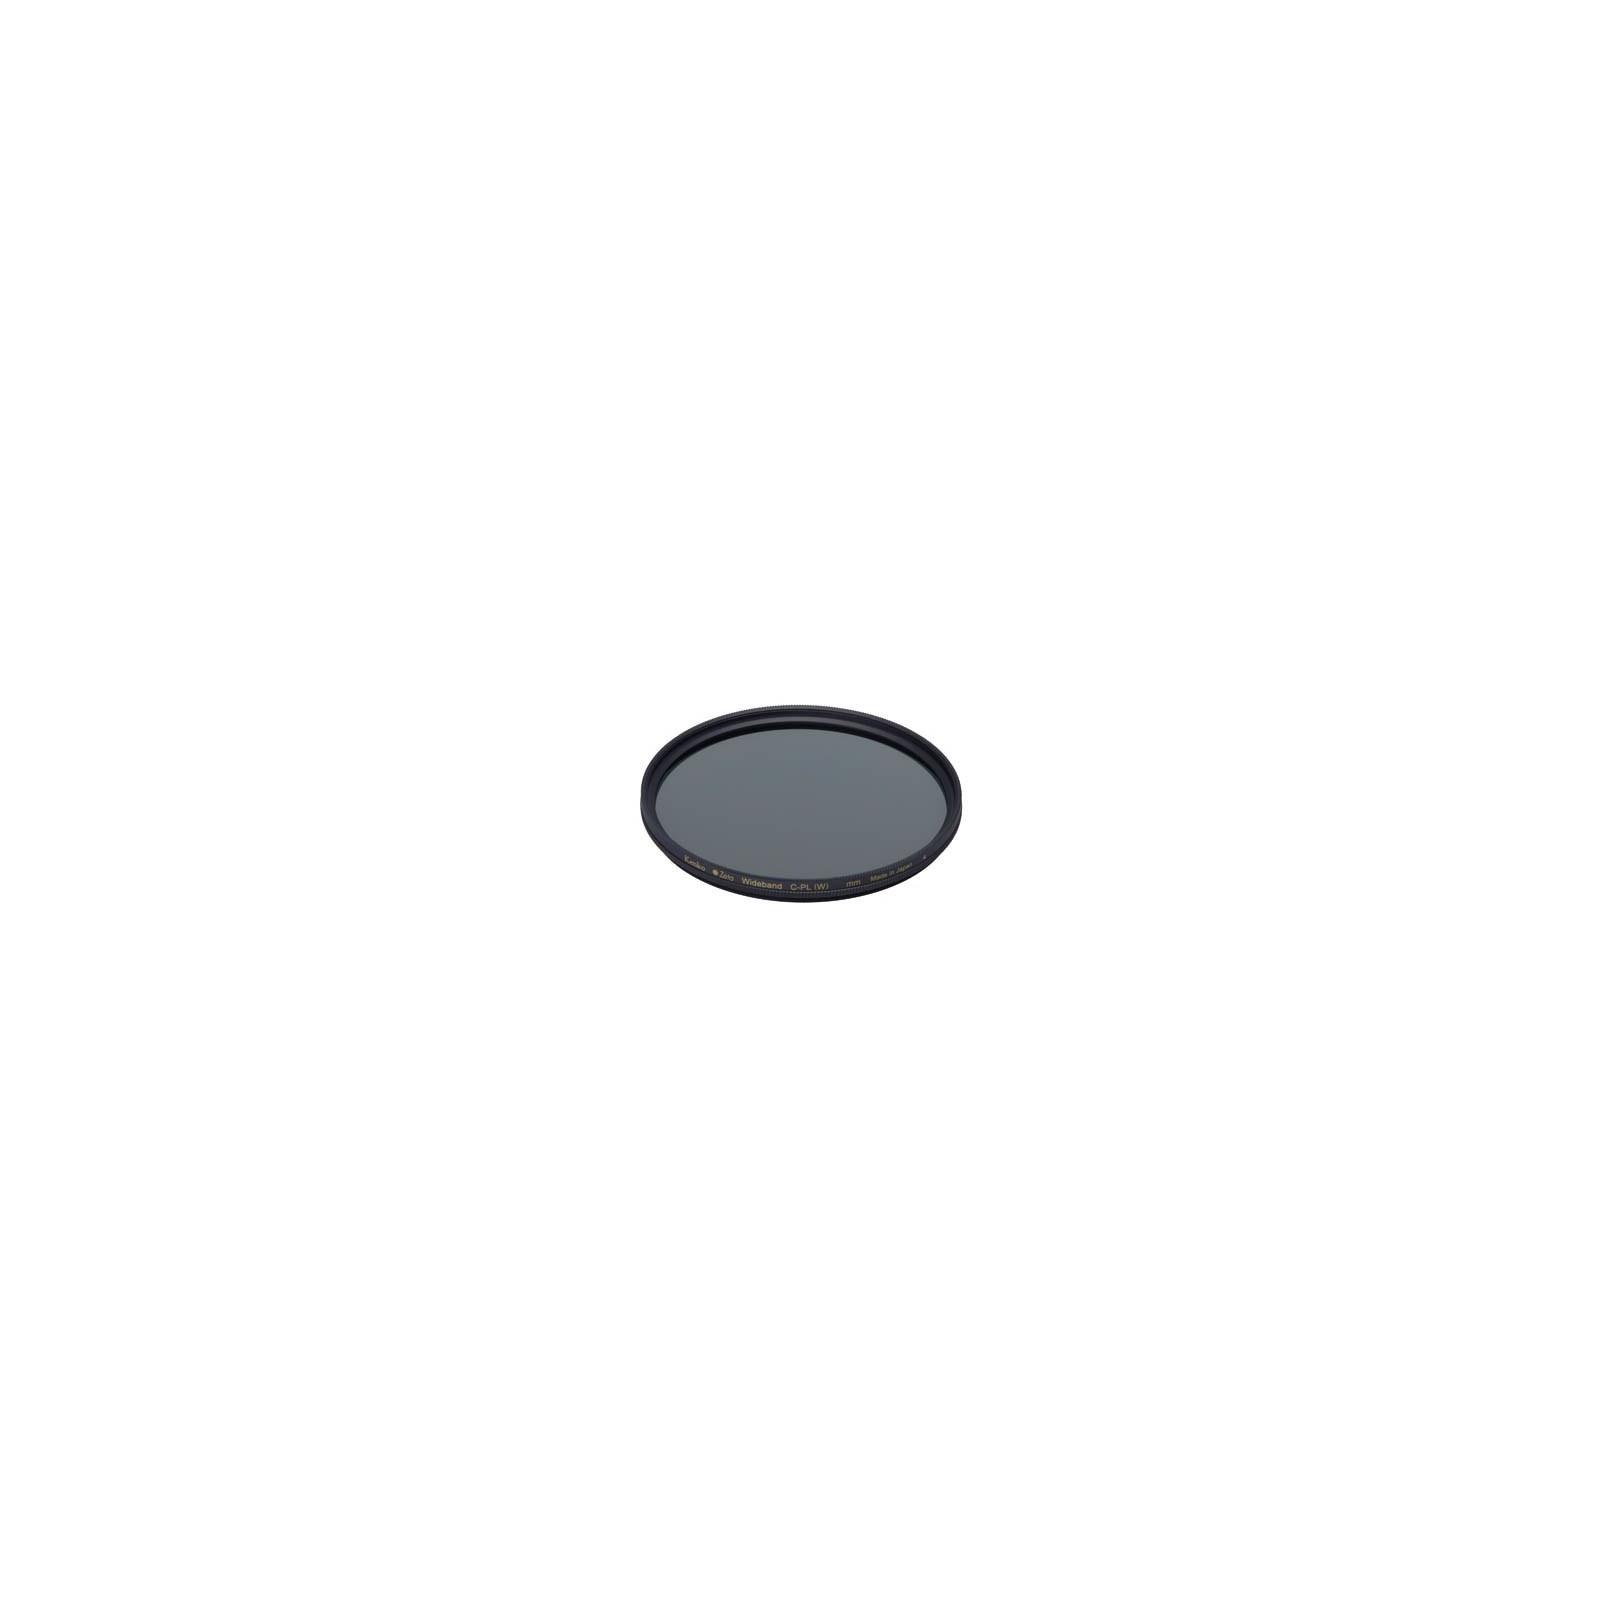 Светофильтр Kenko E-CPL 77mm (38351)